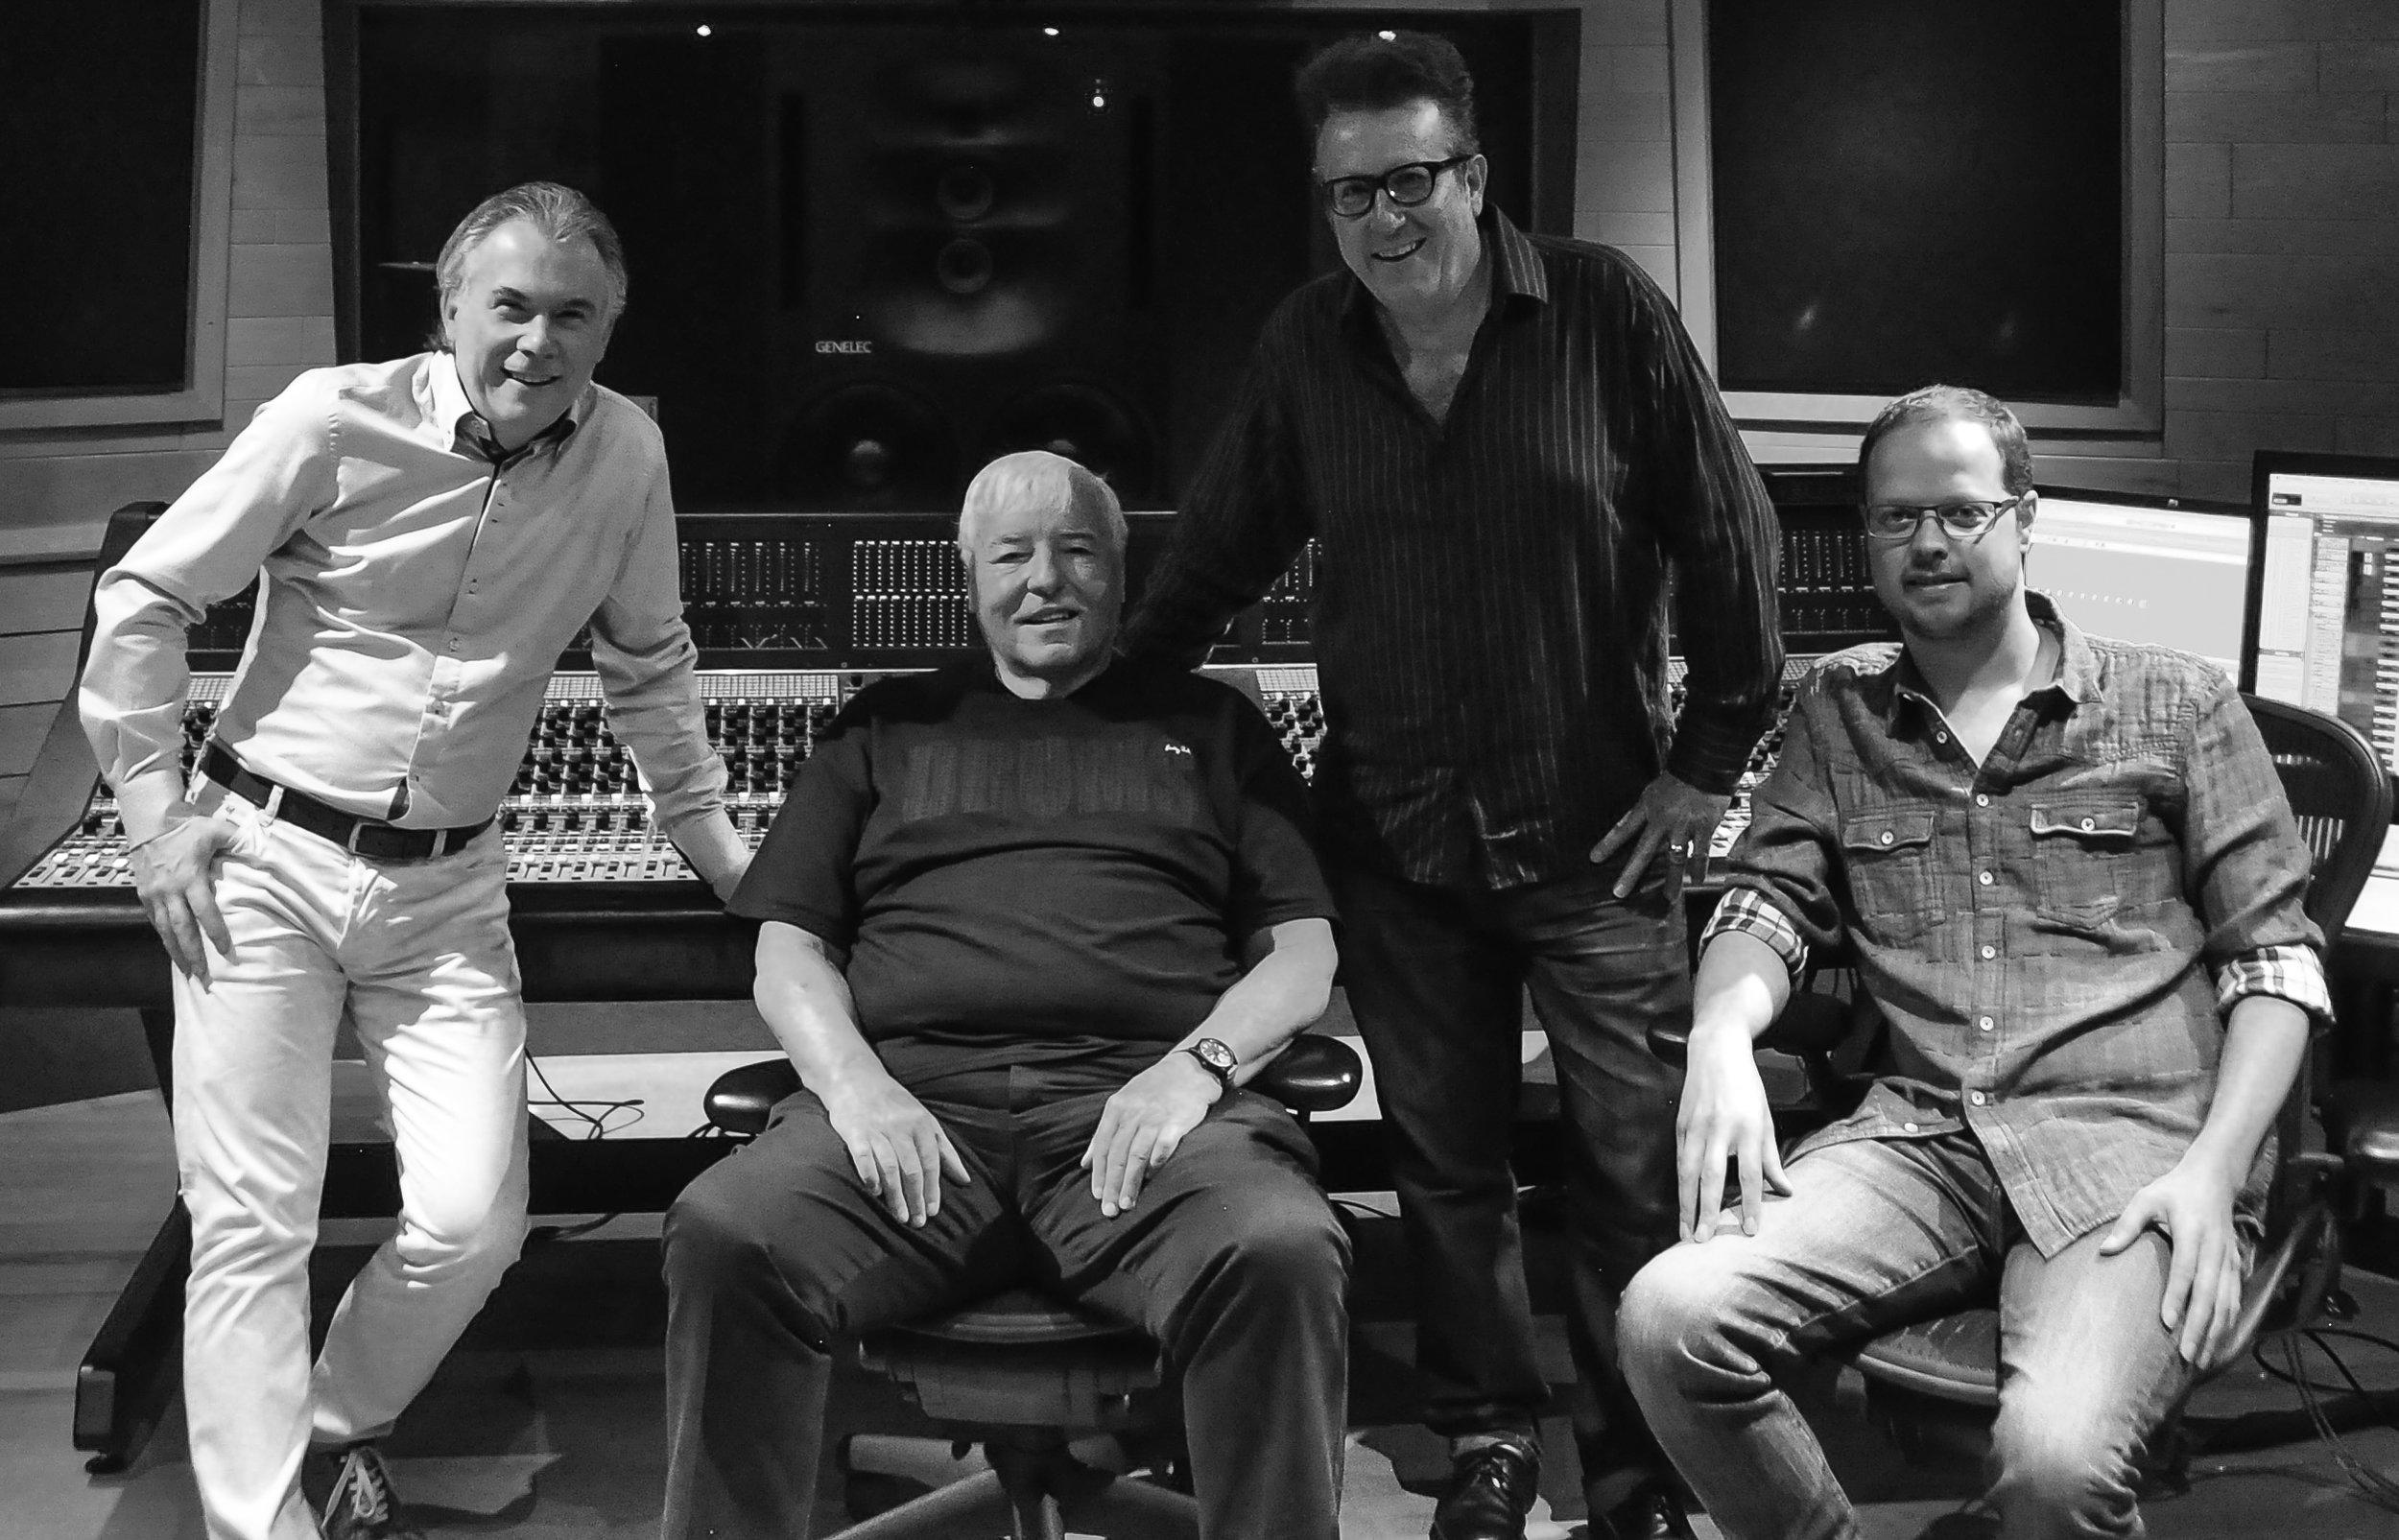 Wilifried, Gary , Bernie & Patrick at Galaxy